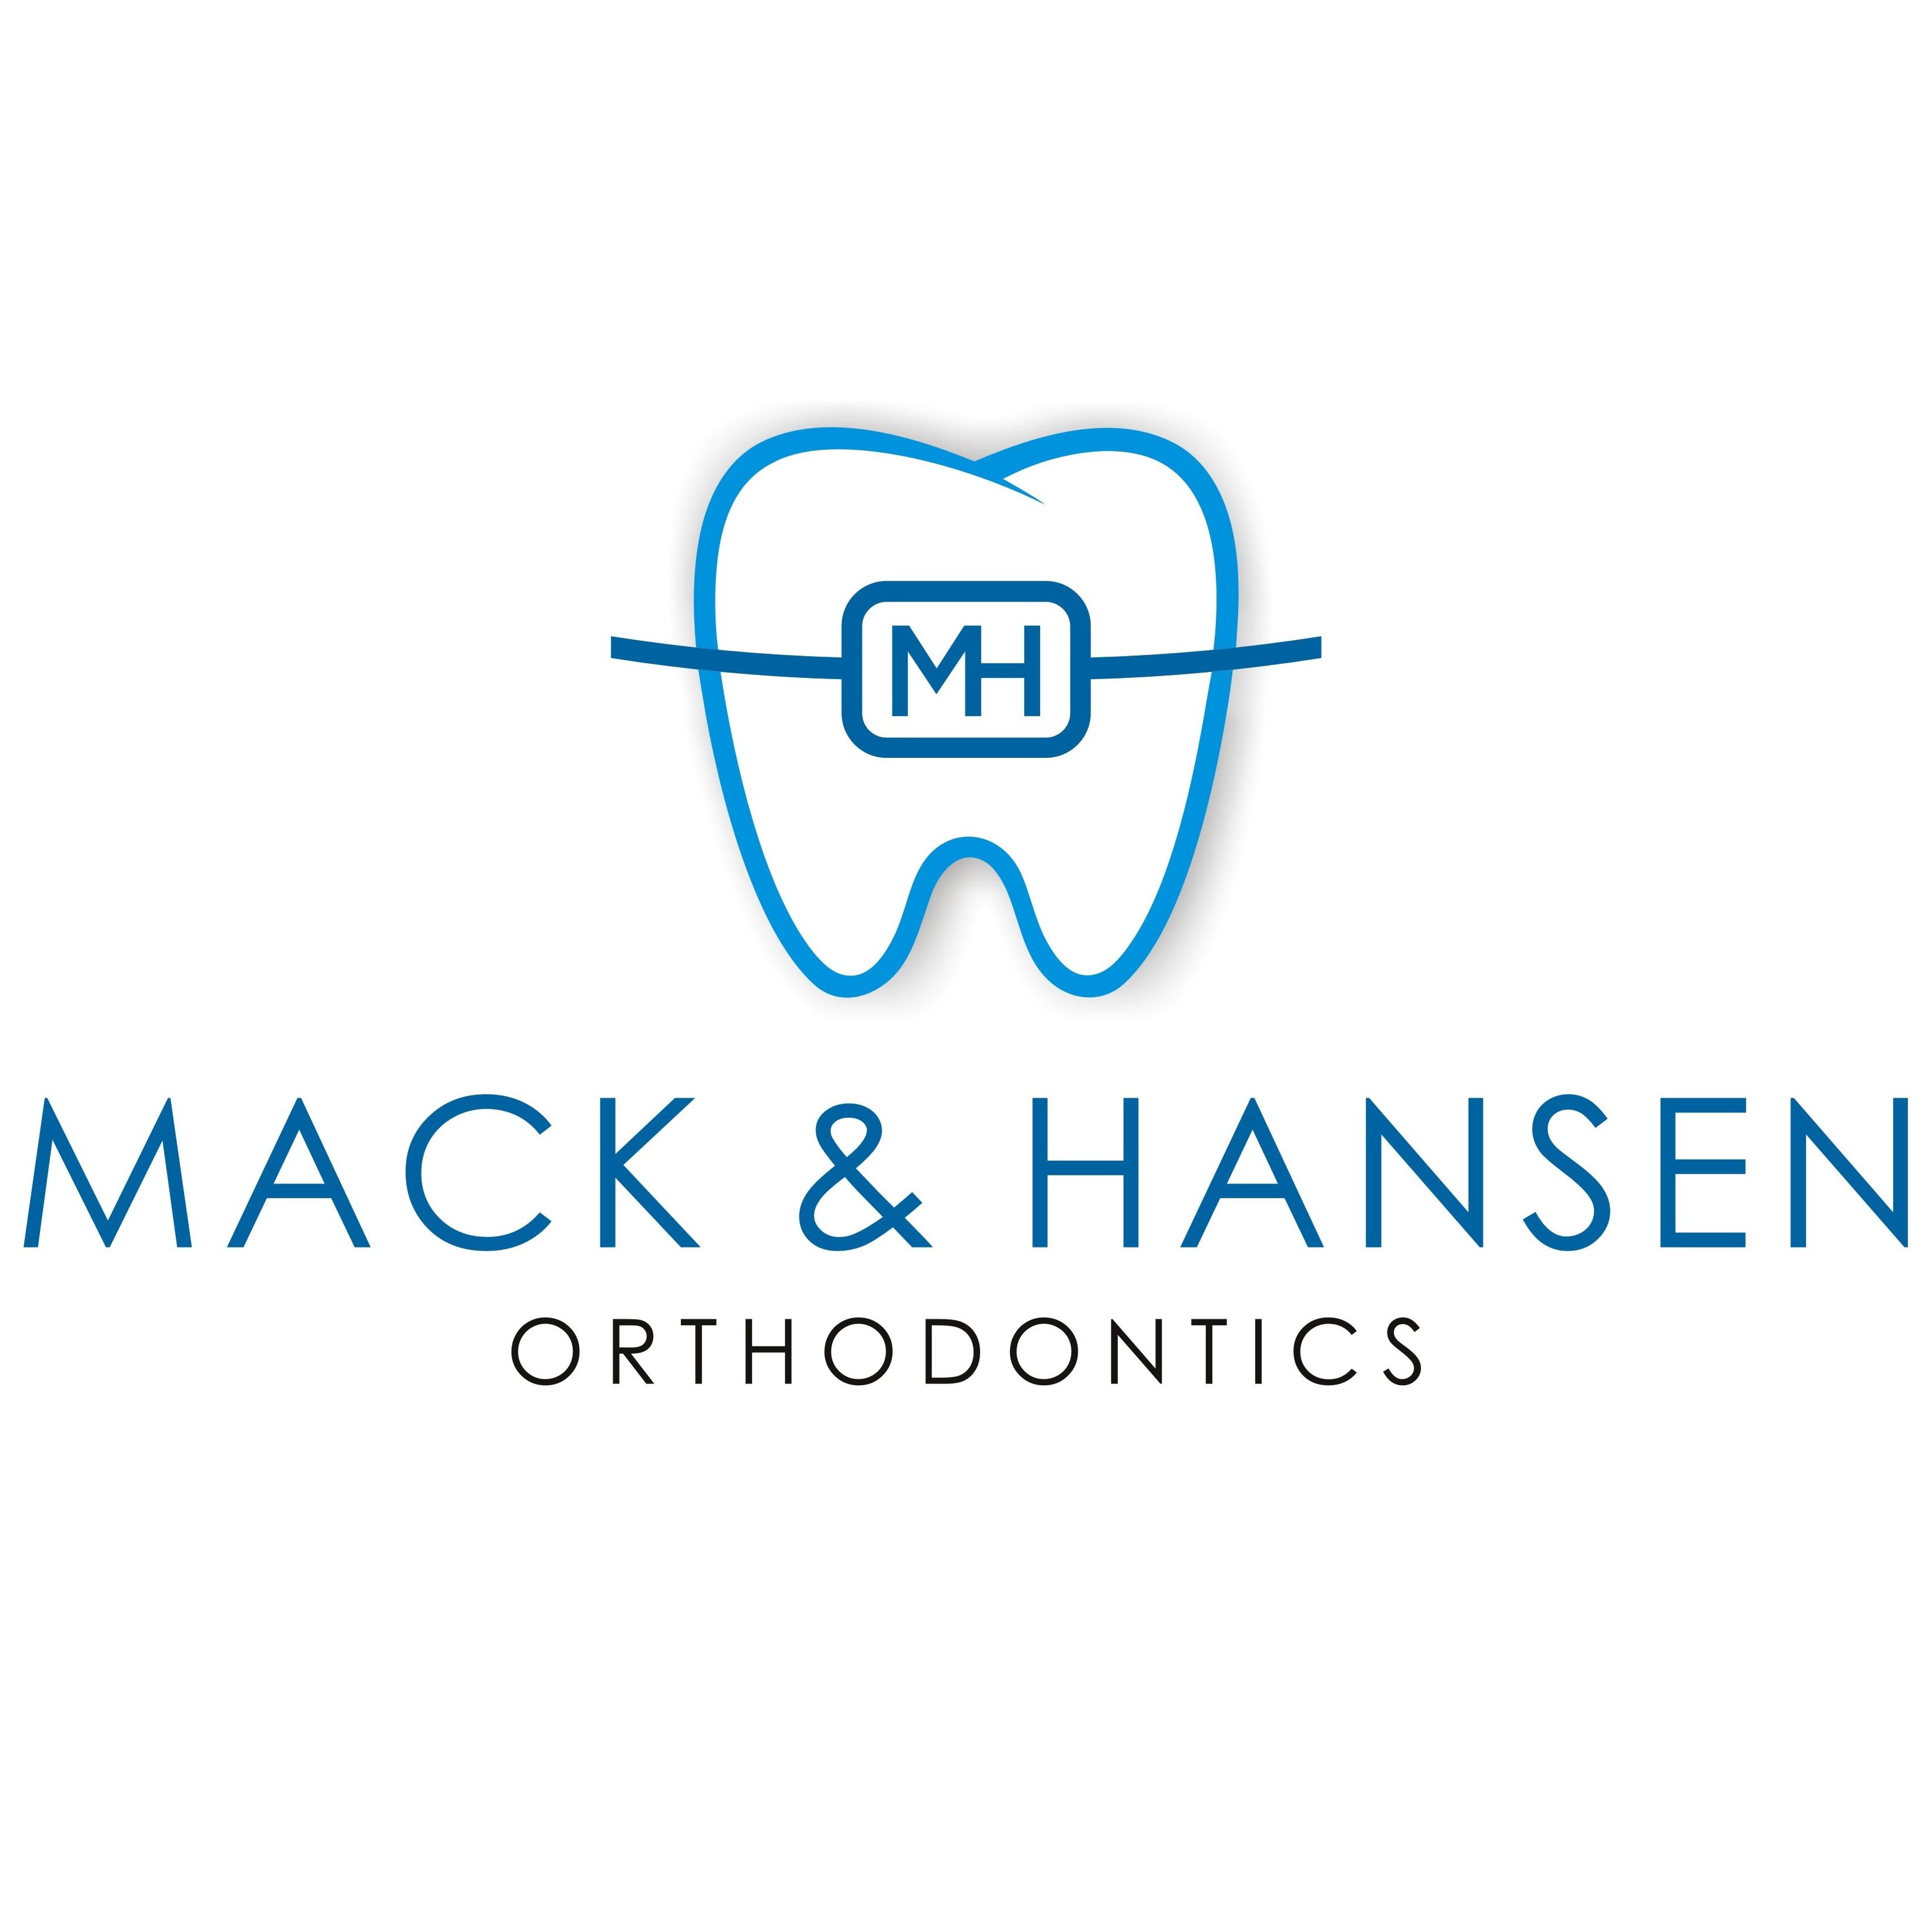 Mack and Hansen Orthodontics image 10